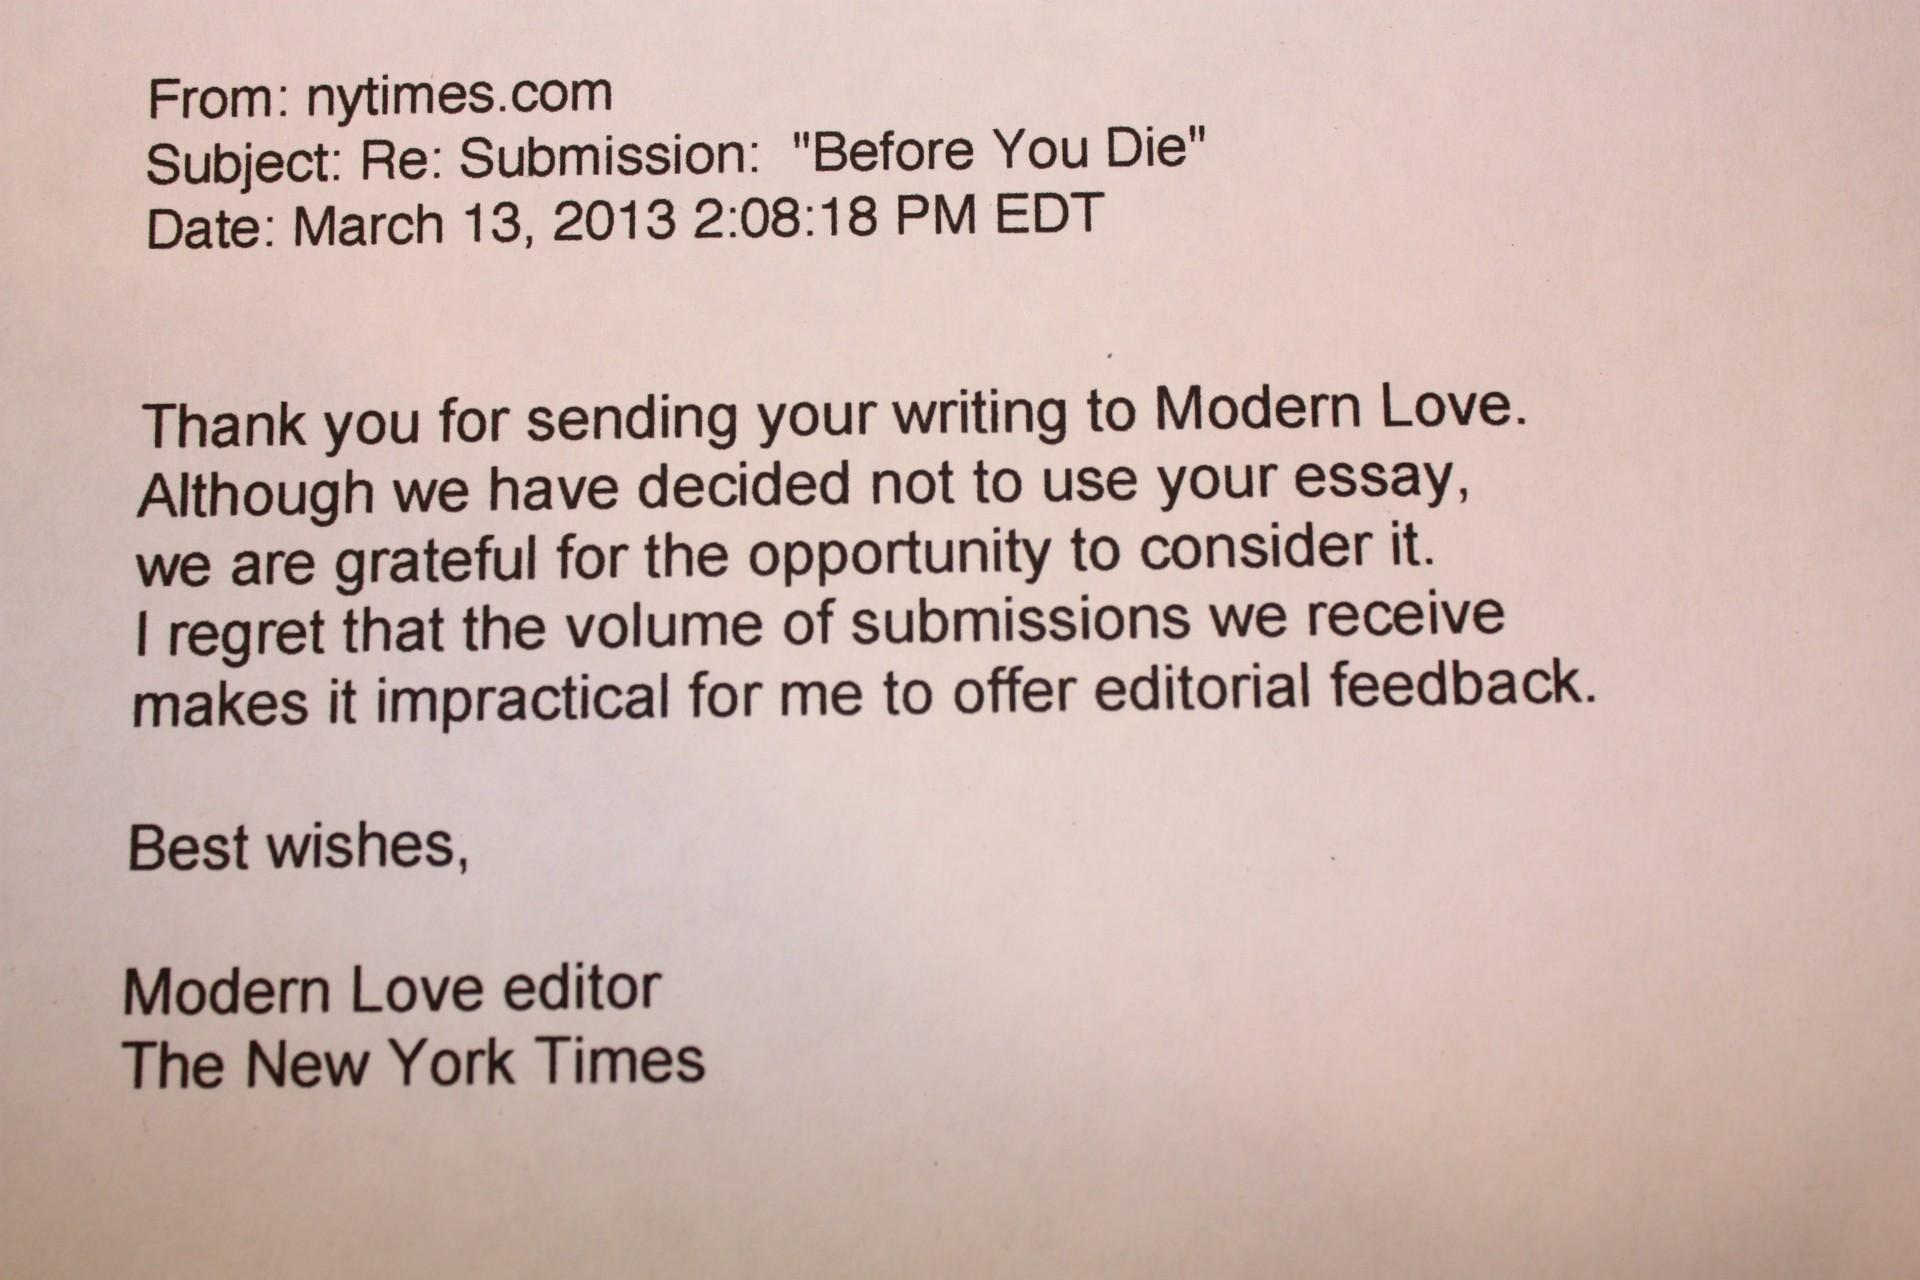 008 Essay Example Img 1382 Modern Love Phenomenal Essays Contest Winner Amy Rosenthal 1920